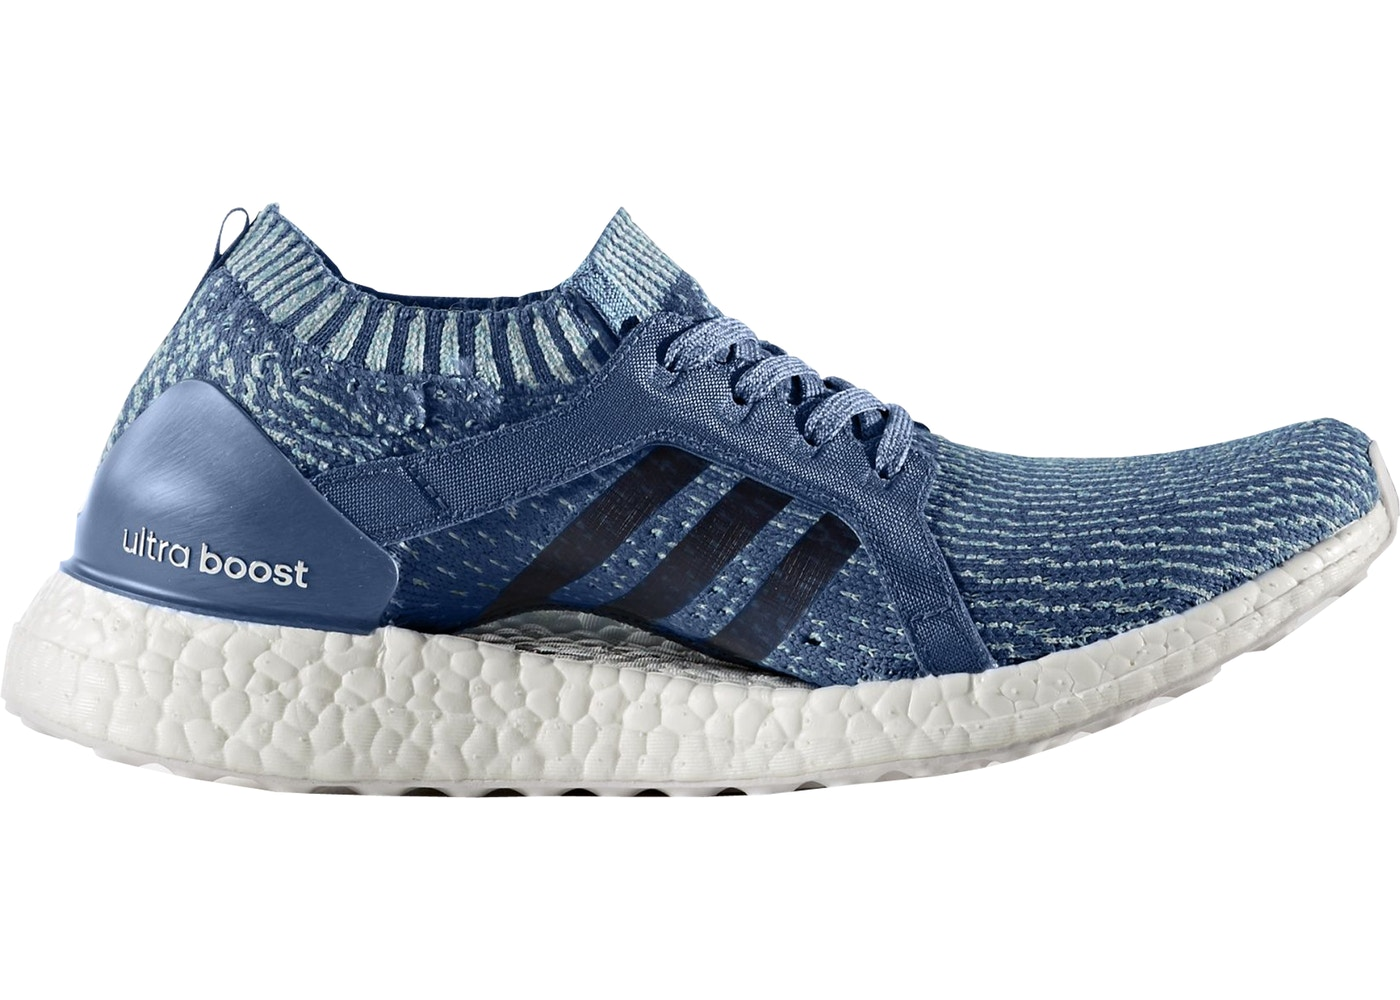 adidas Ultra Boost Shoes - Lowest Ask 0e952862e0f4